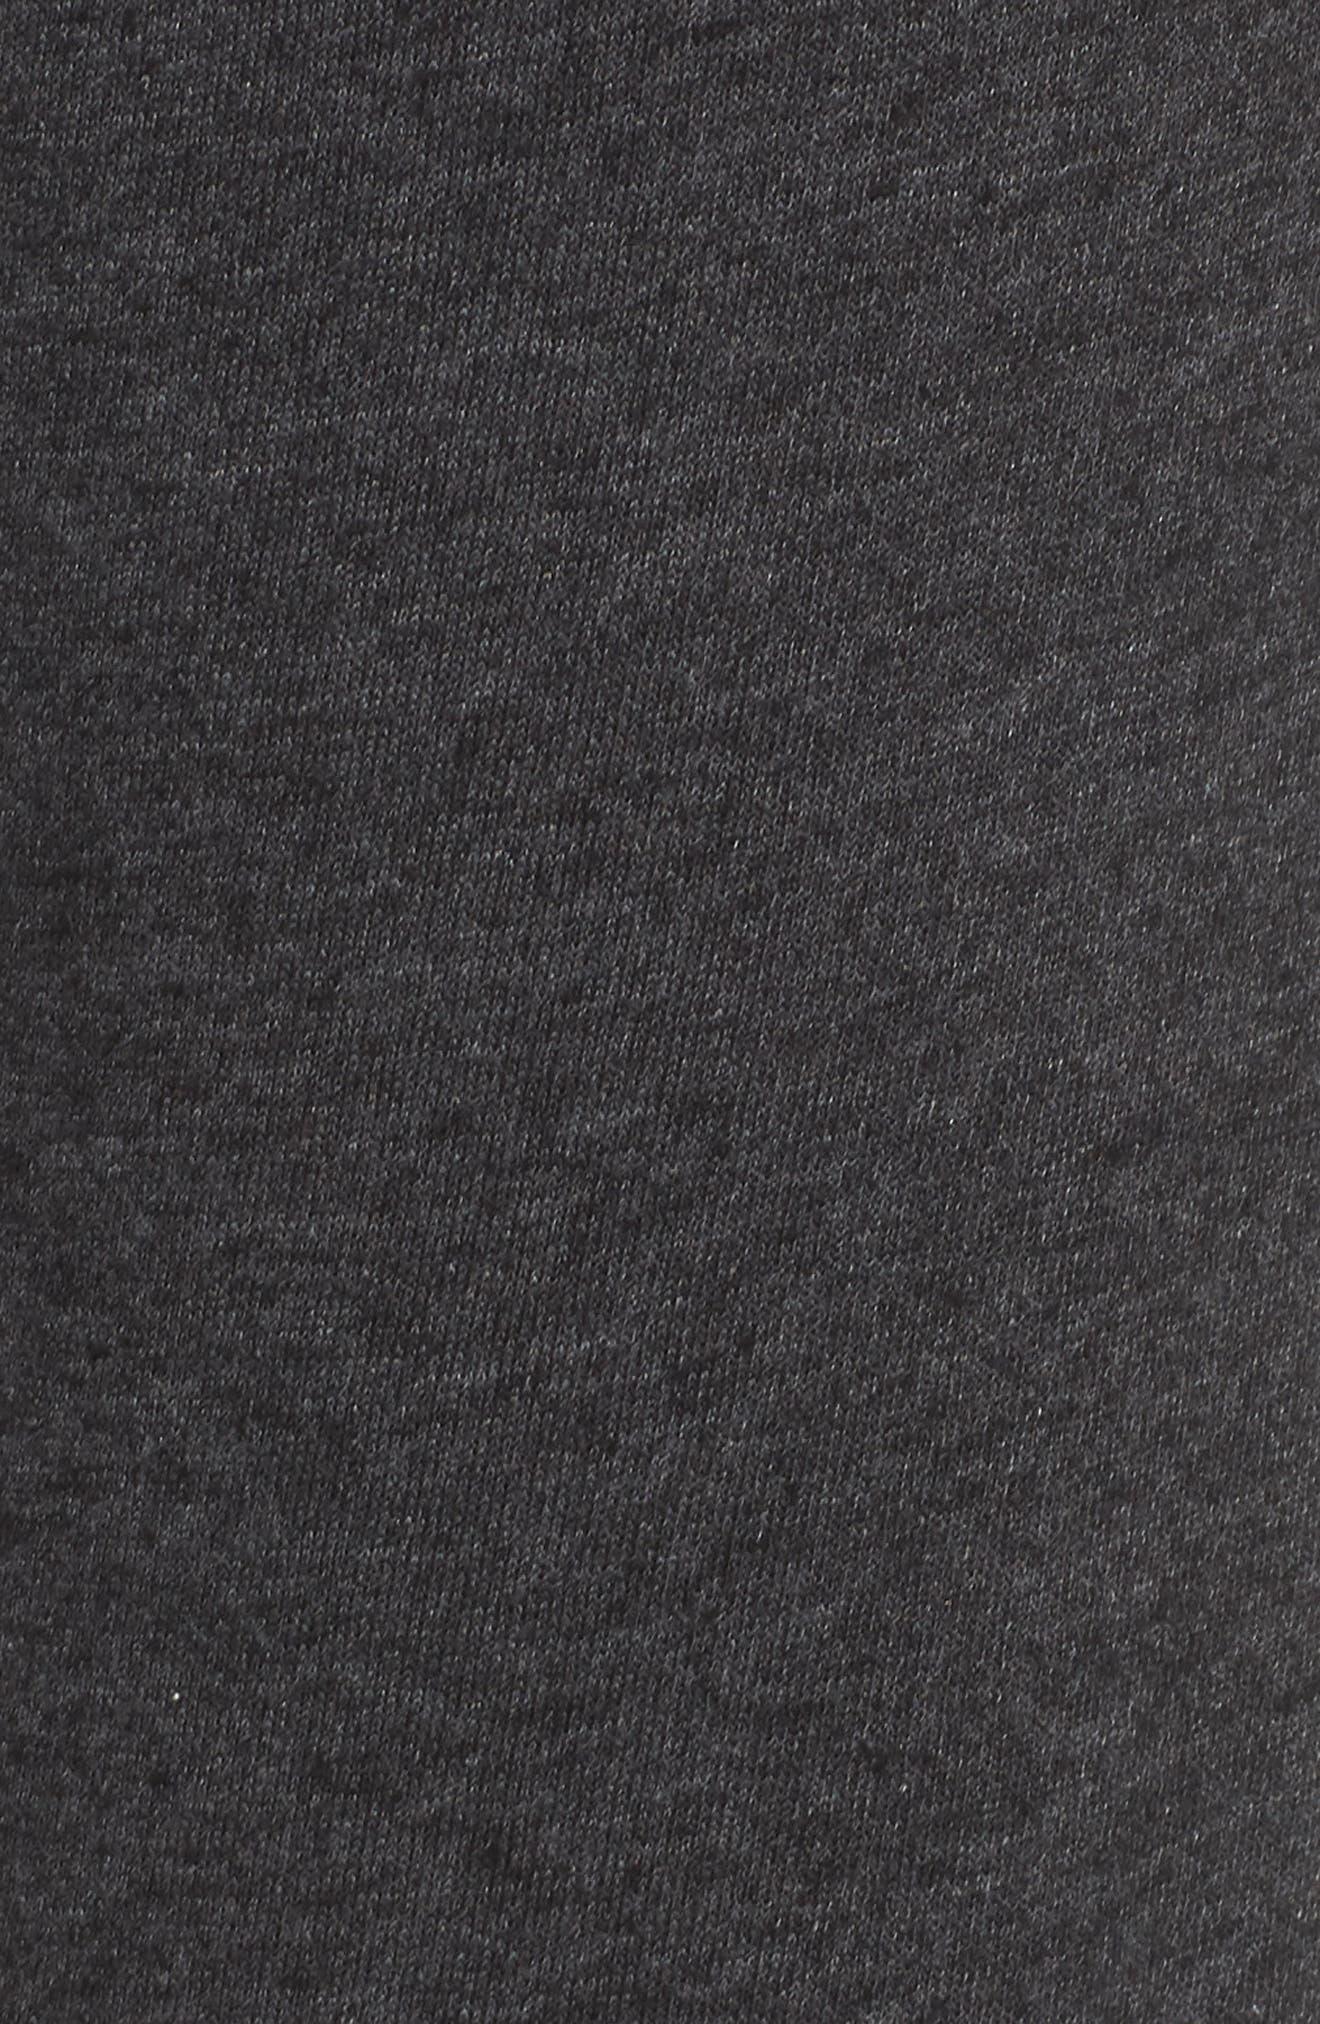 Grateful Perfect Knit Pants,                             Alternate thumbnail 6, color,                             009